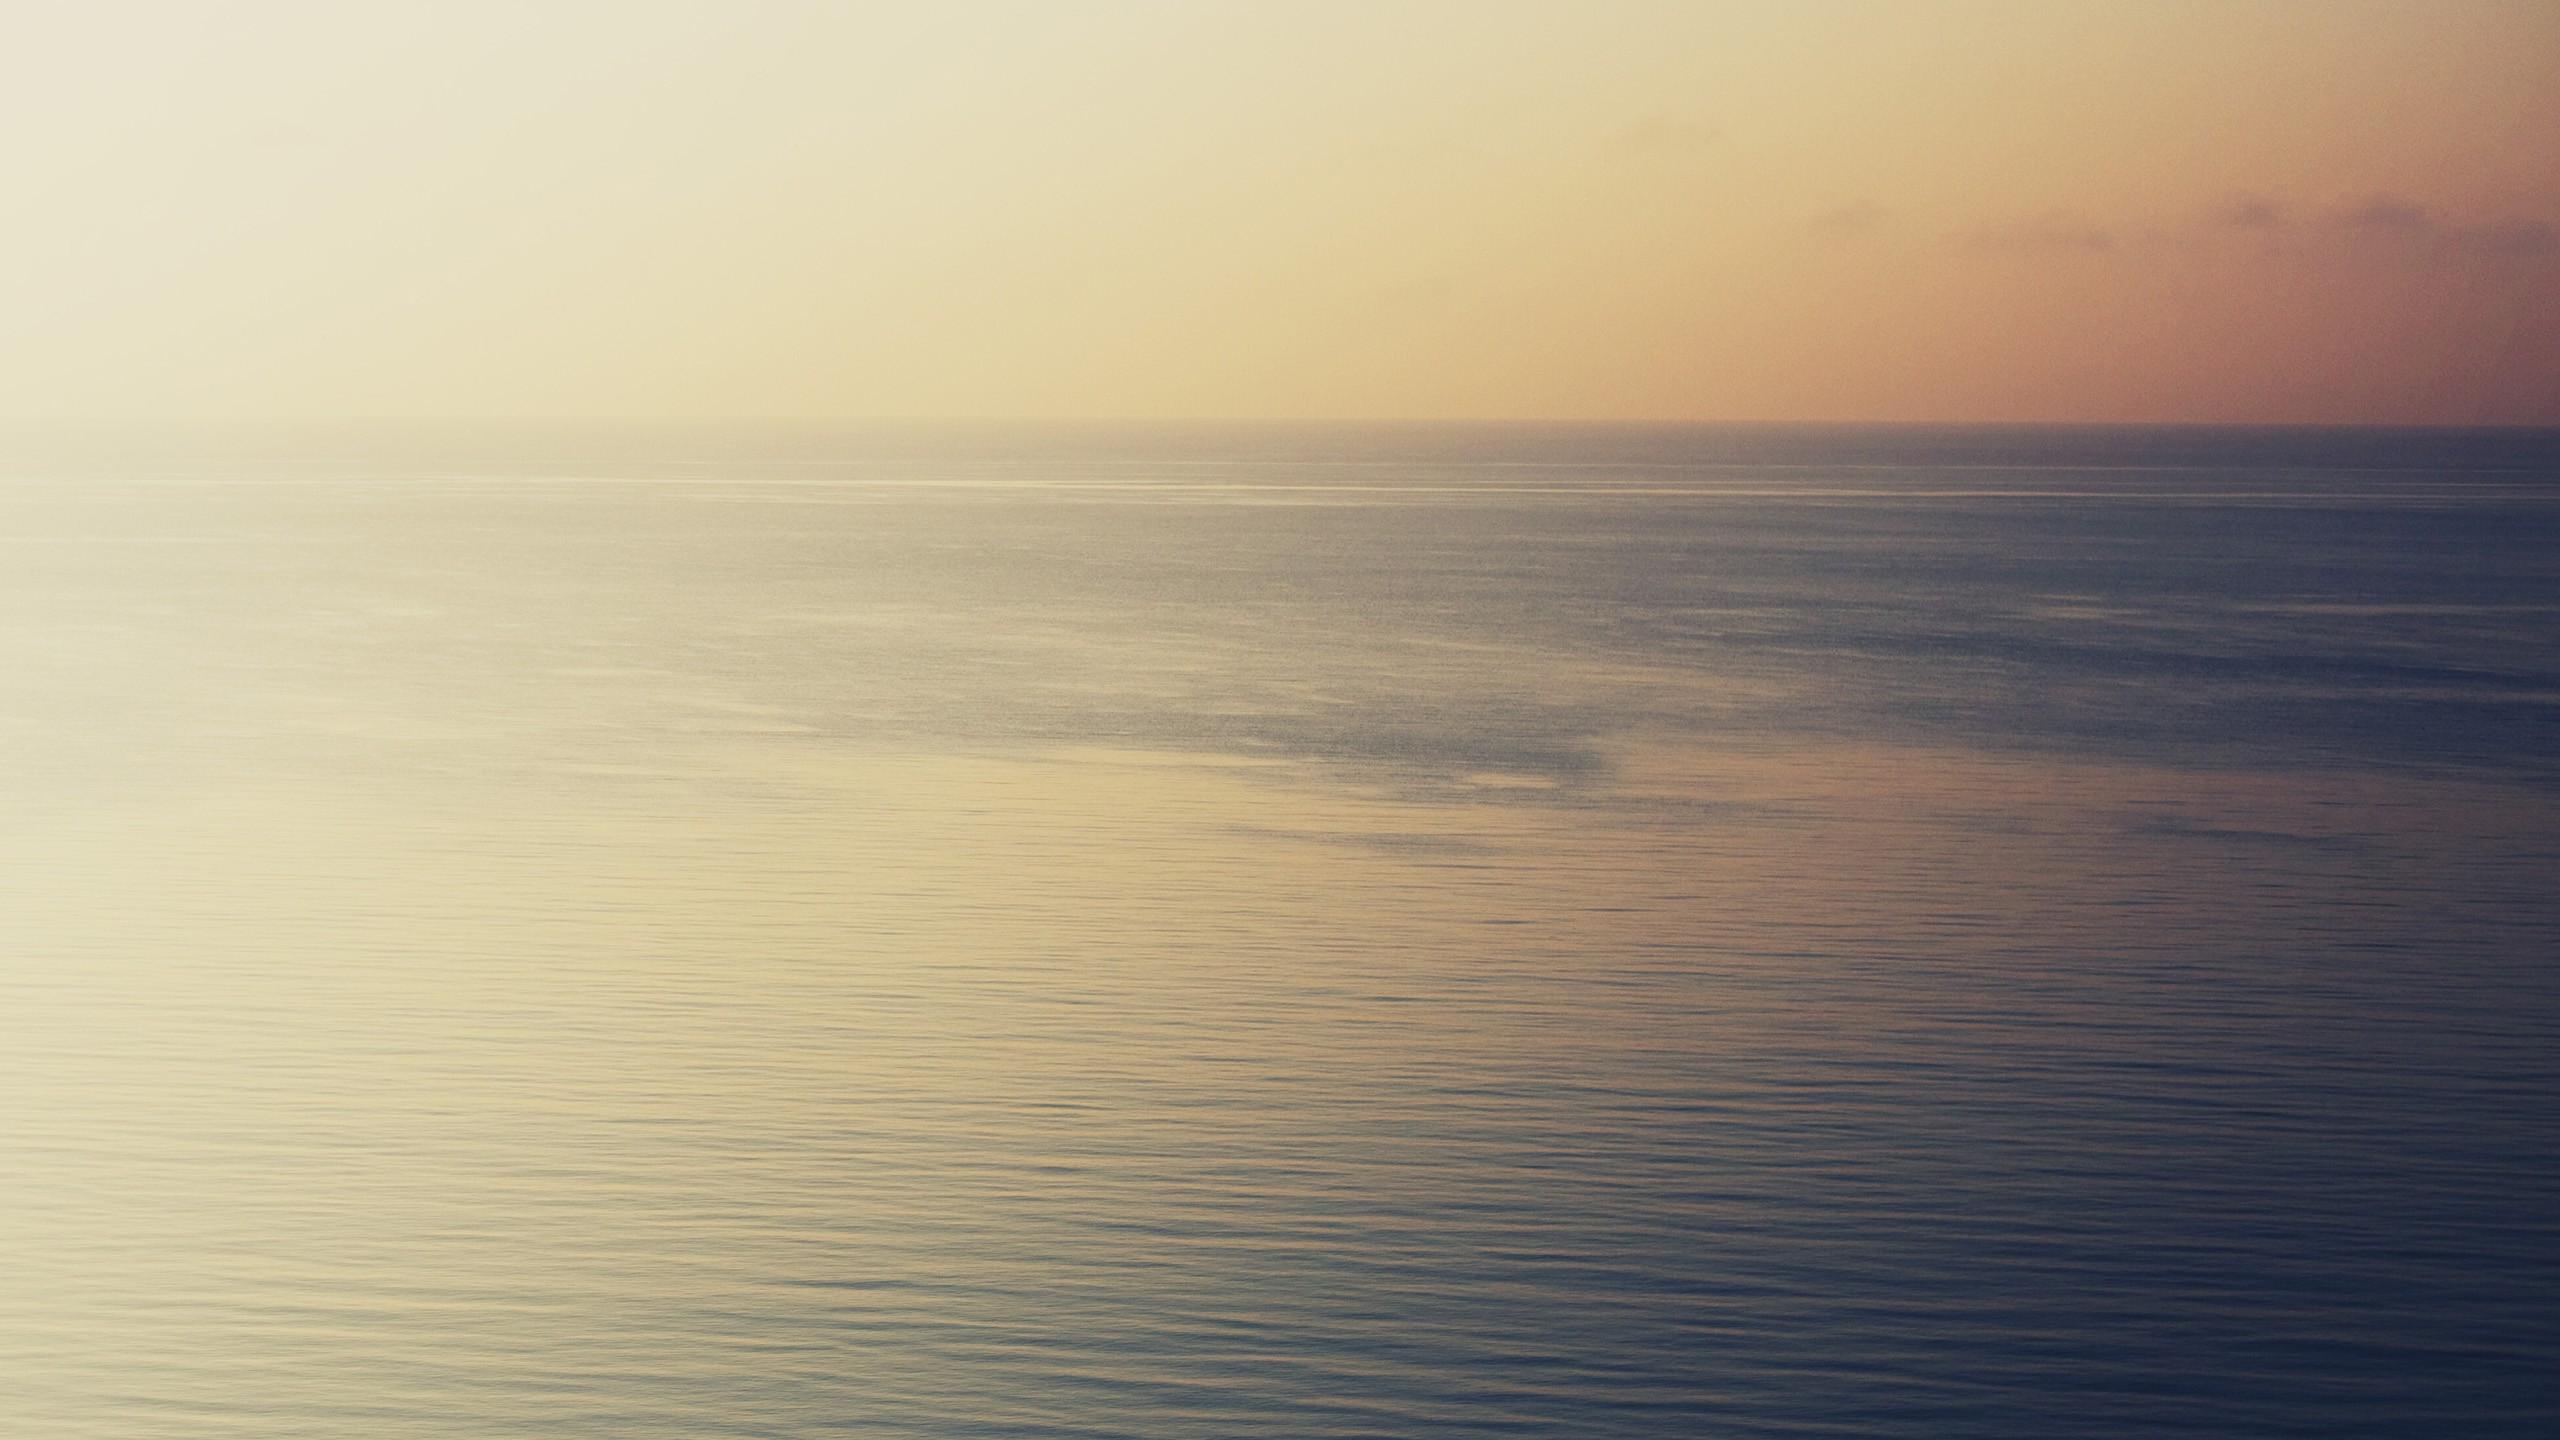 Minimal Sea Wallpaperjpg 2560x1440